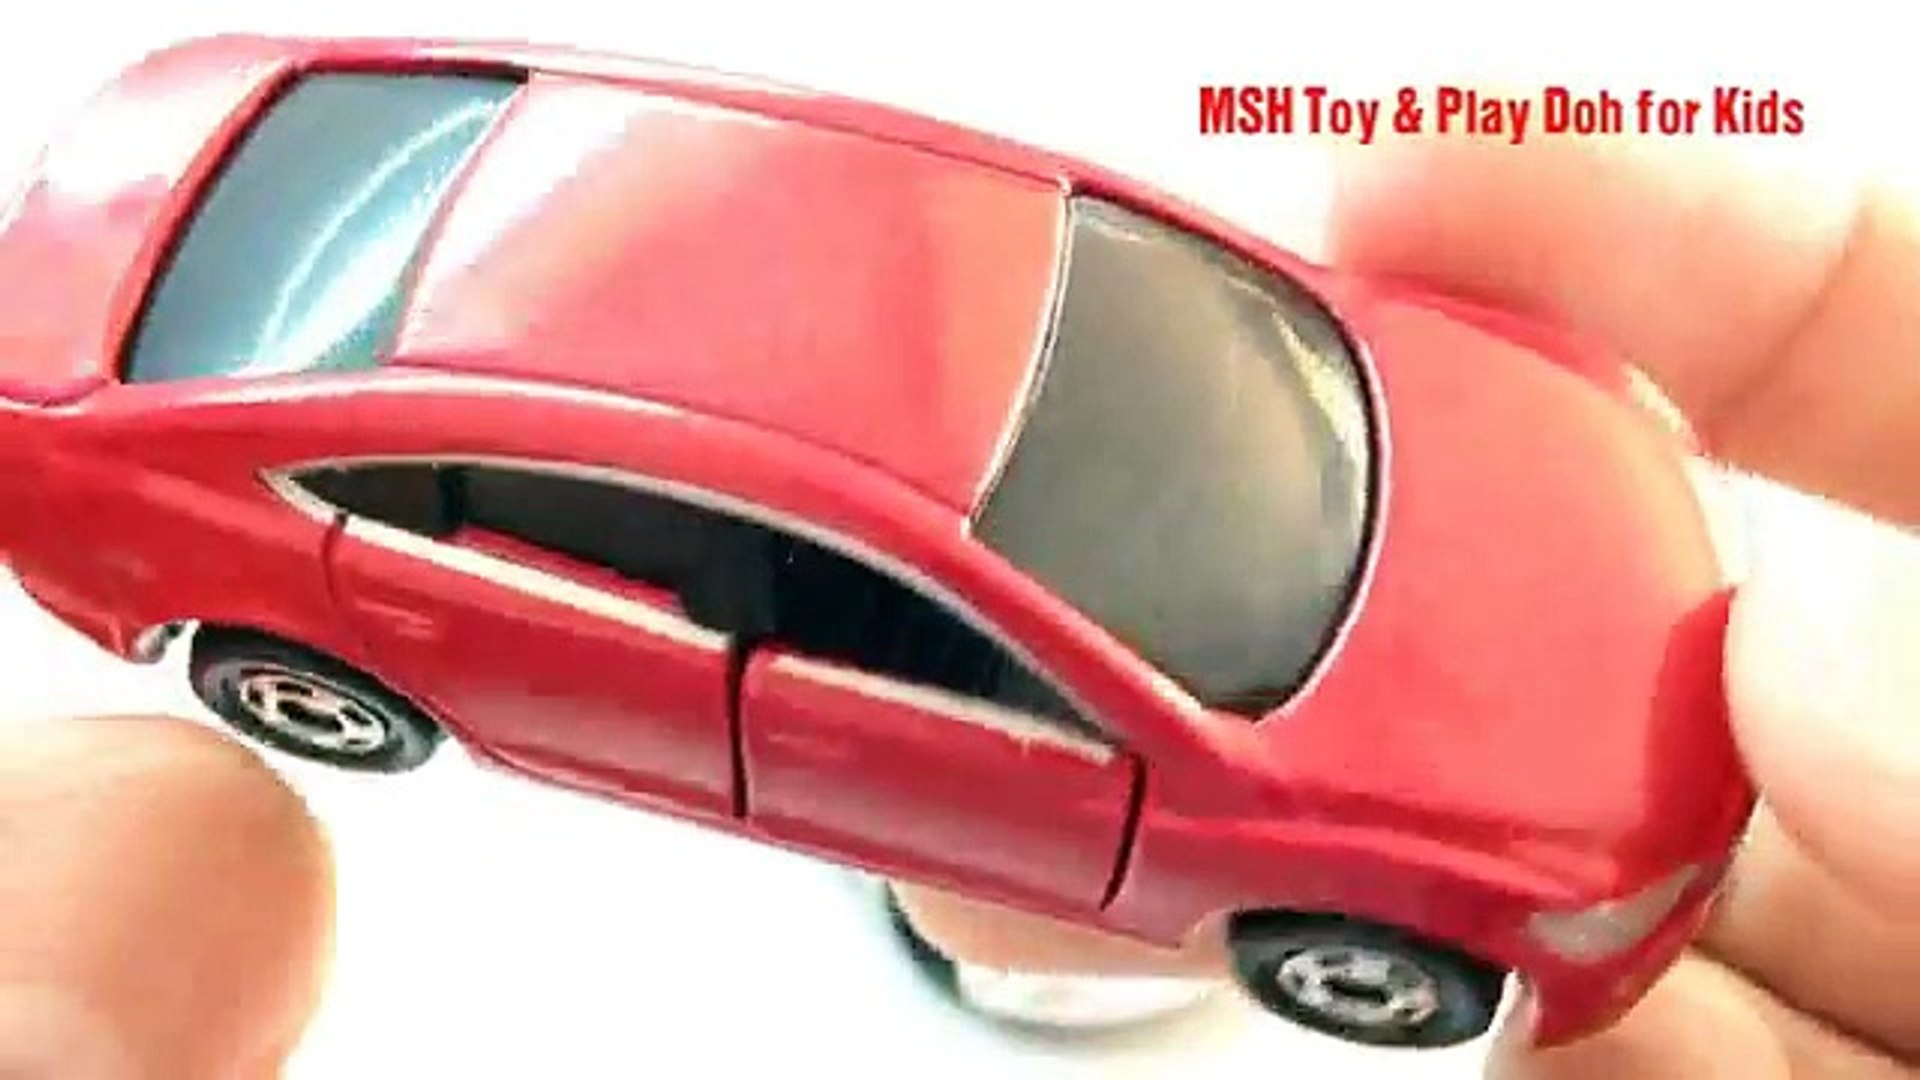 Mini Toy cars| Lotus Evora Gte Vs Mazda Atenza Vs Hitachi Rigid Dump Truck EH3500AC | Tomica Toy Car - Vidéo dailymotion